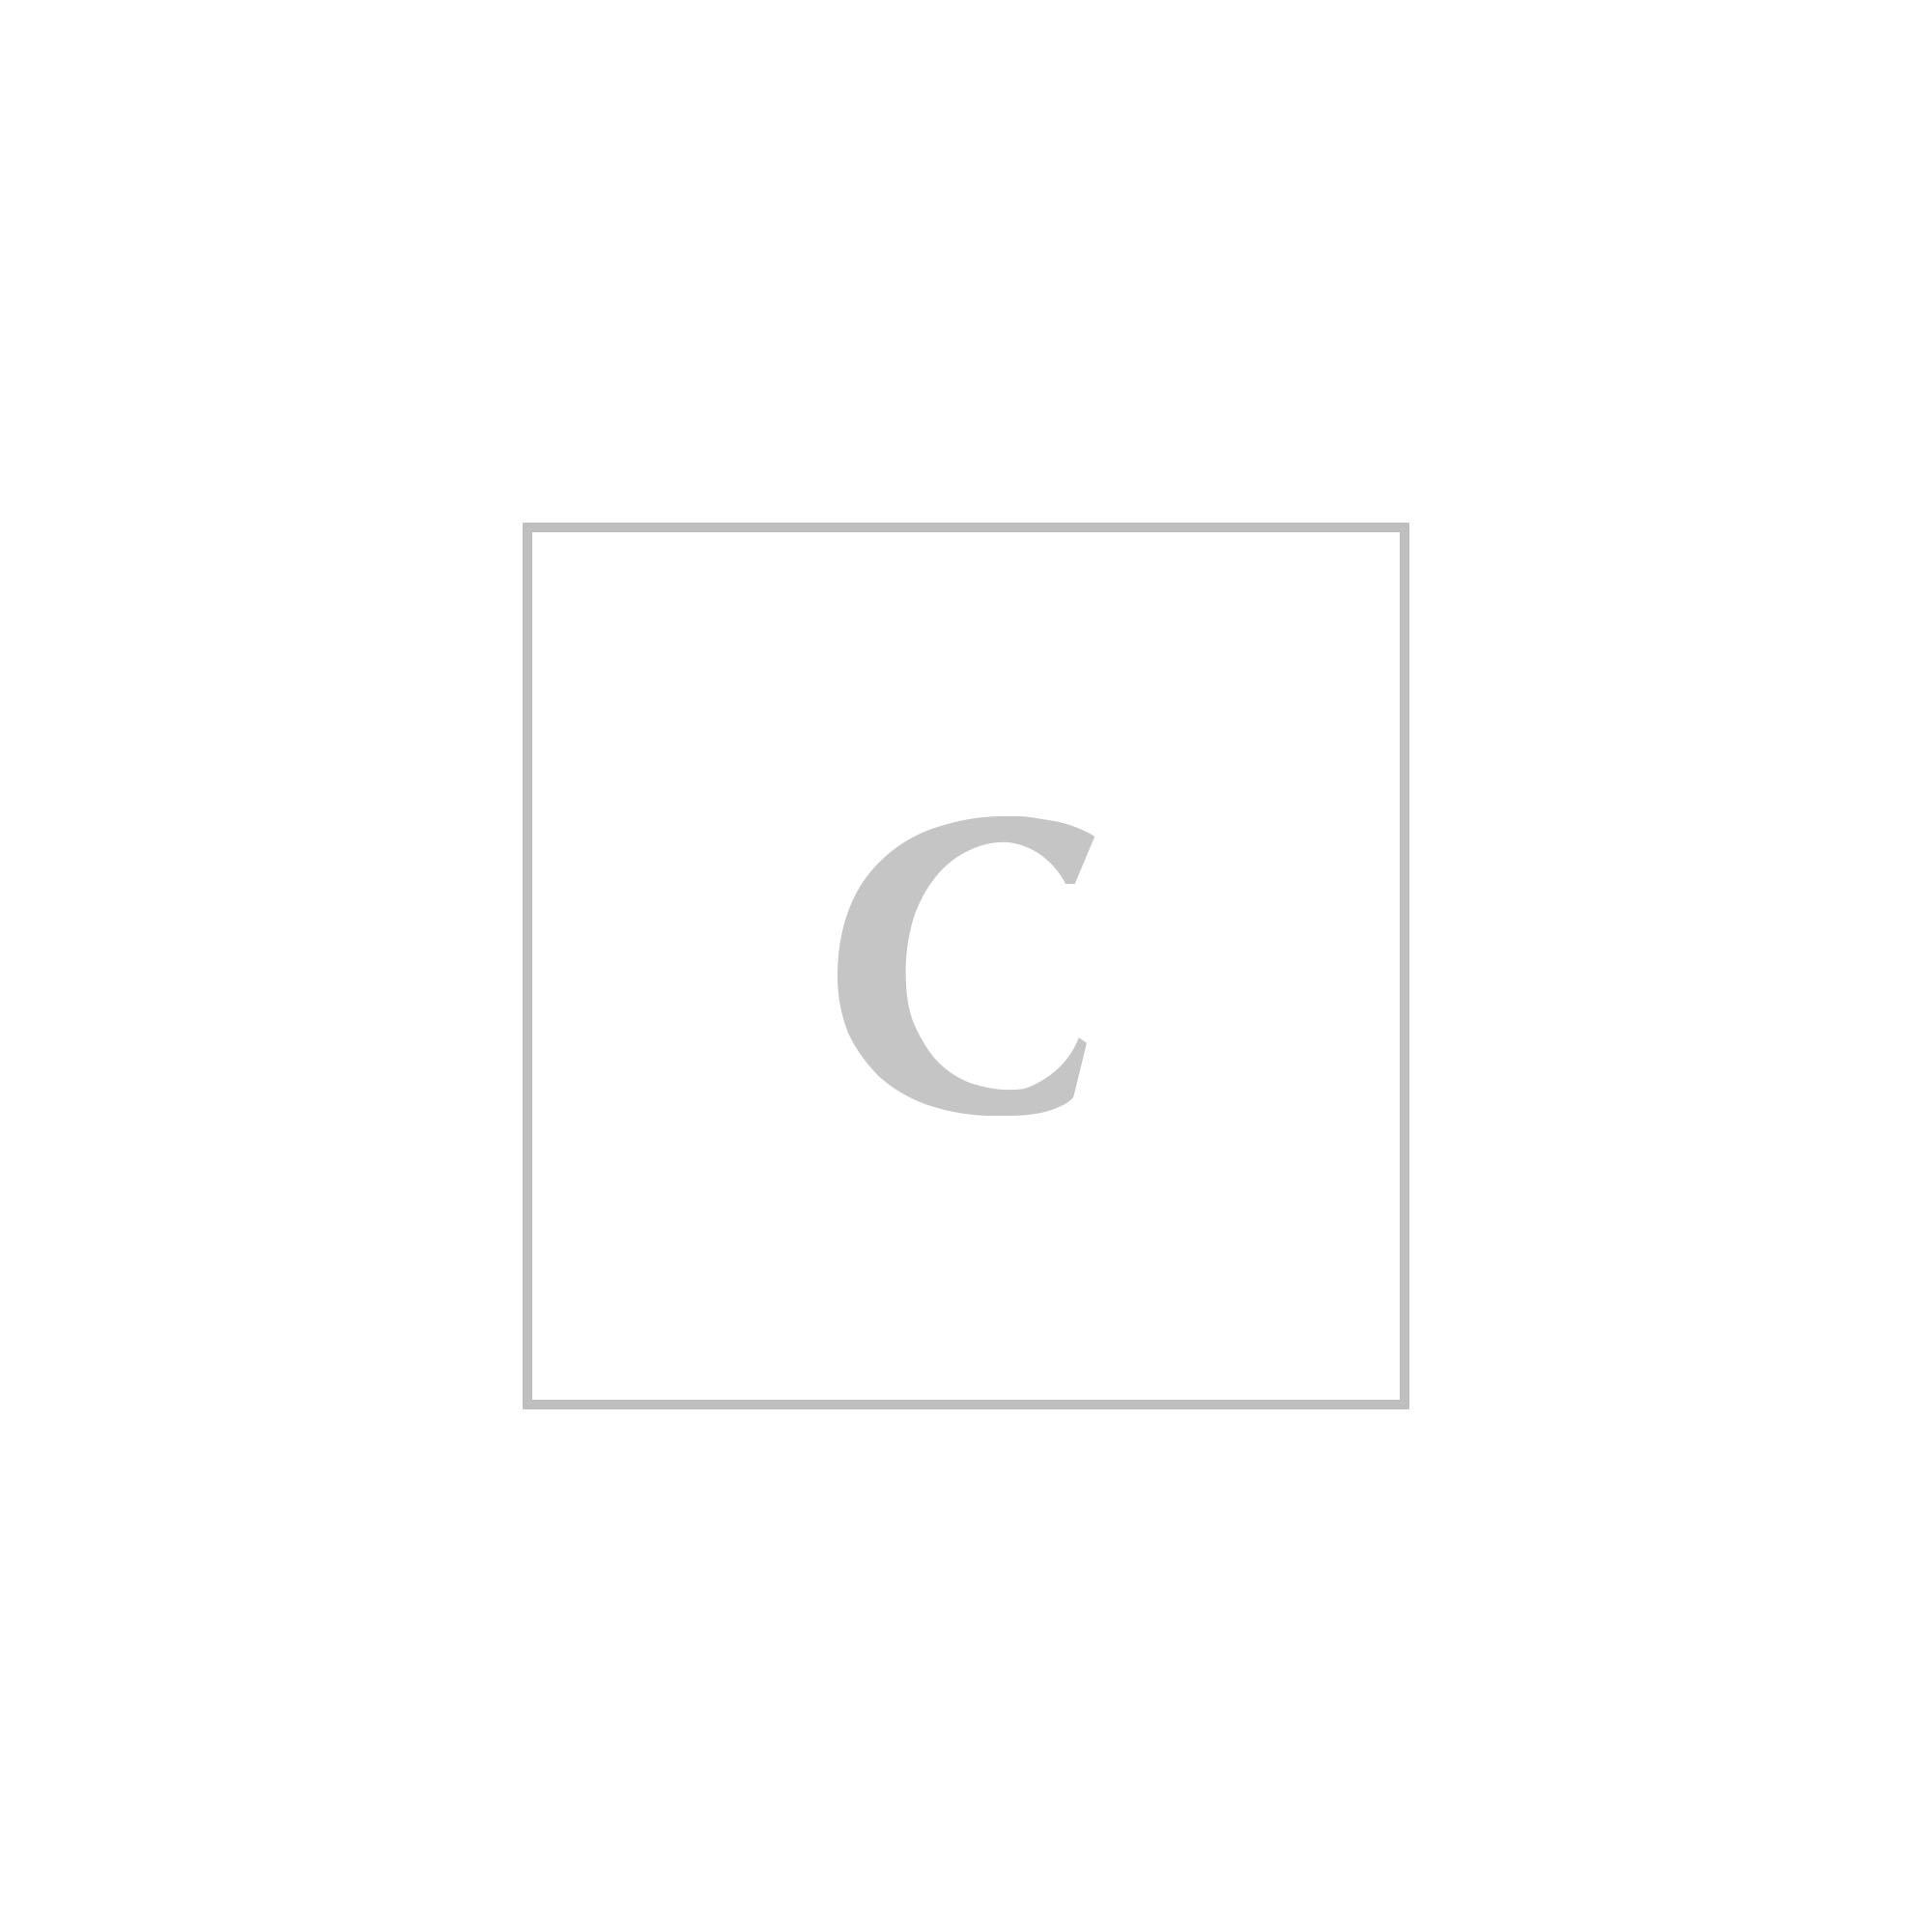 c5144d2963 Mcm borsa crossbody patricia visetos e pelle